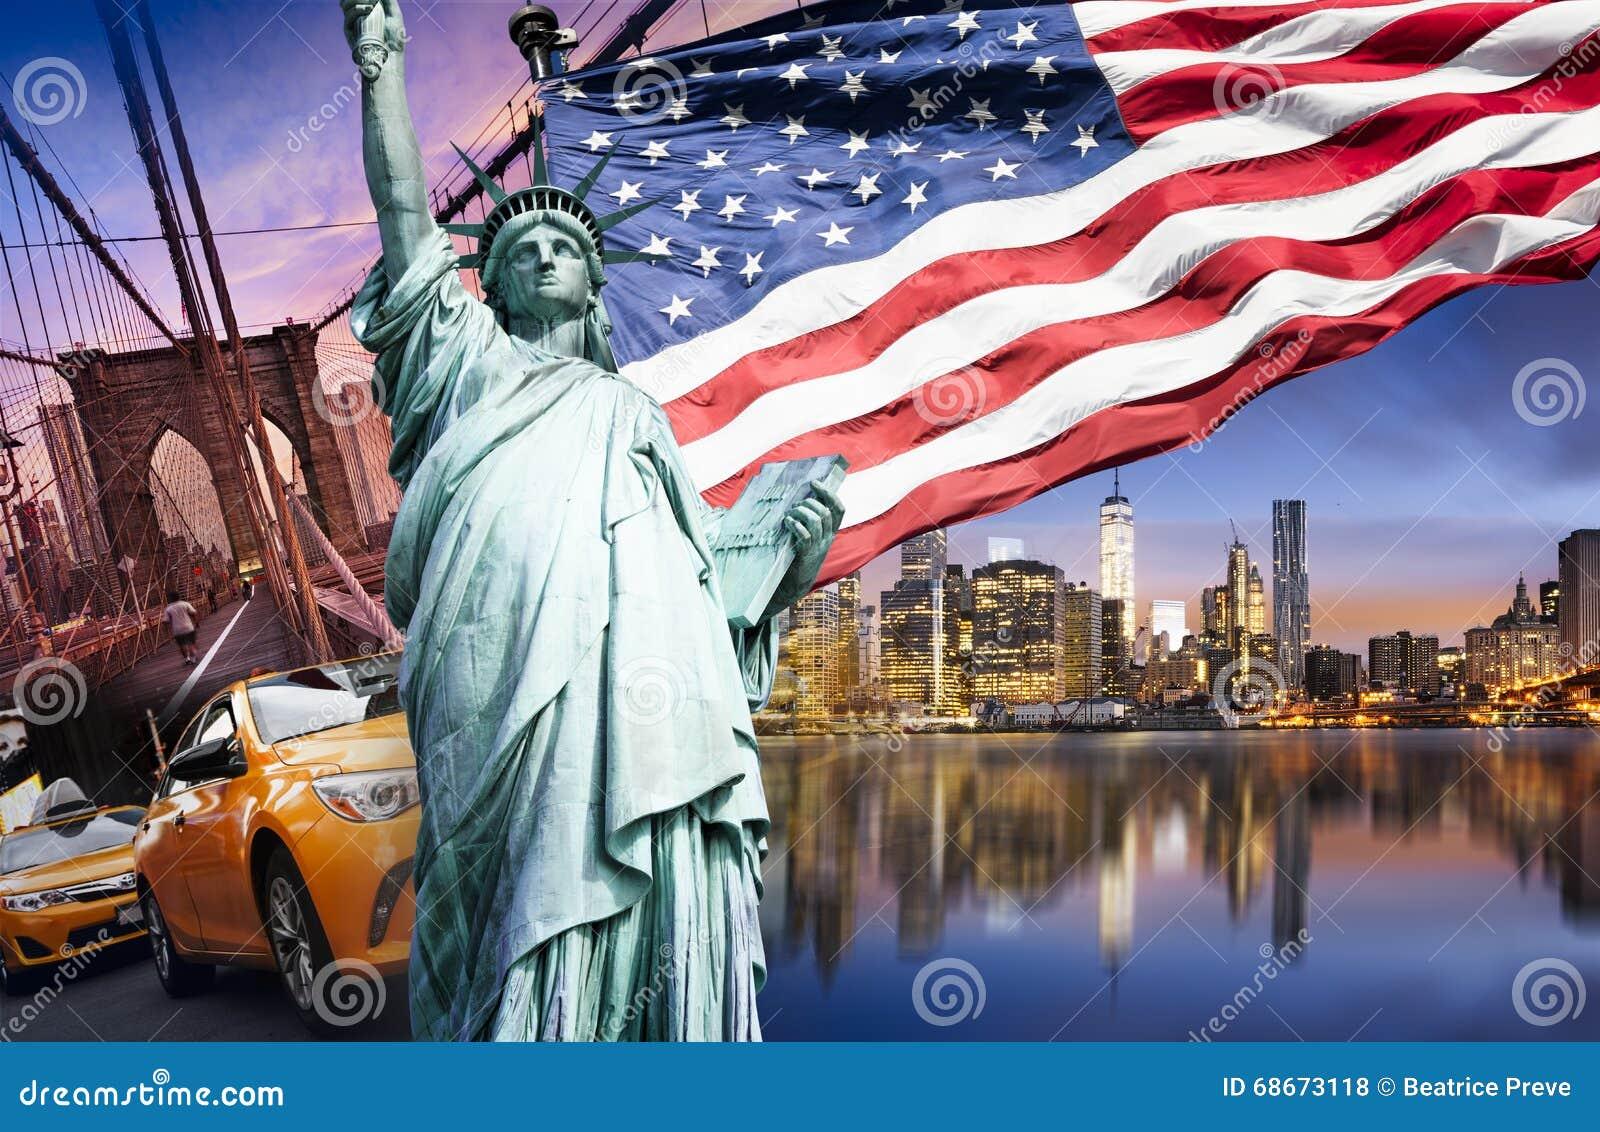 New York City Symbols Stock Photo Image Of Cloud Midtown 68673118